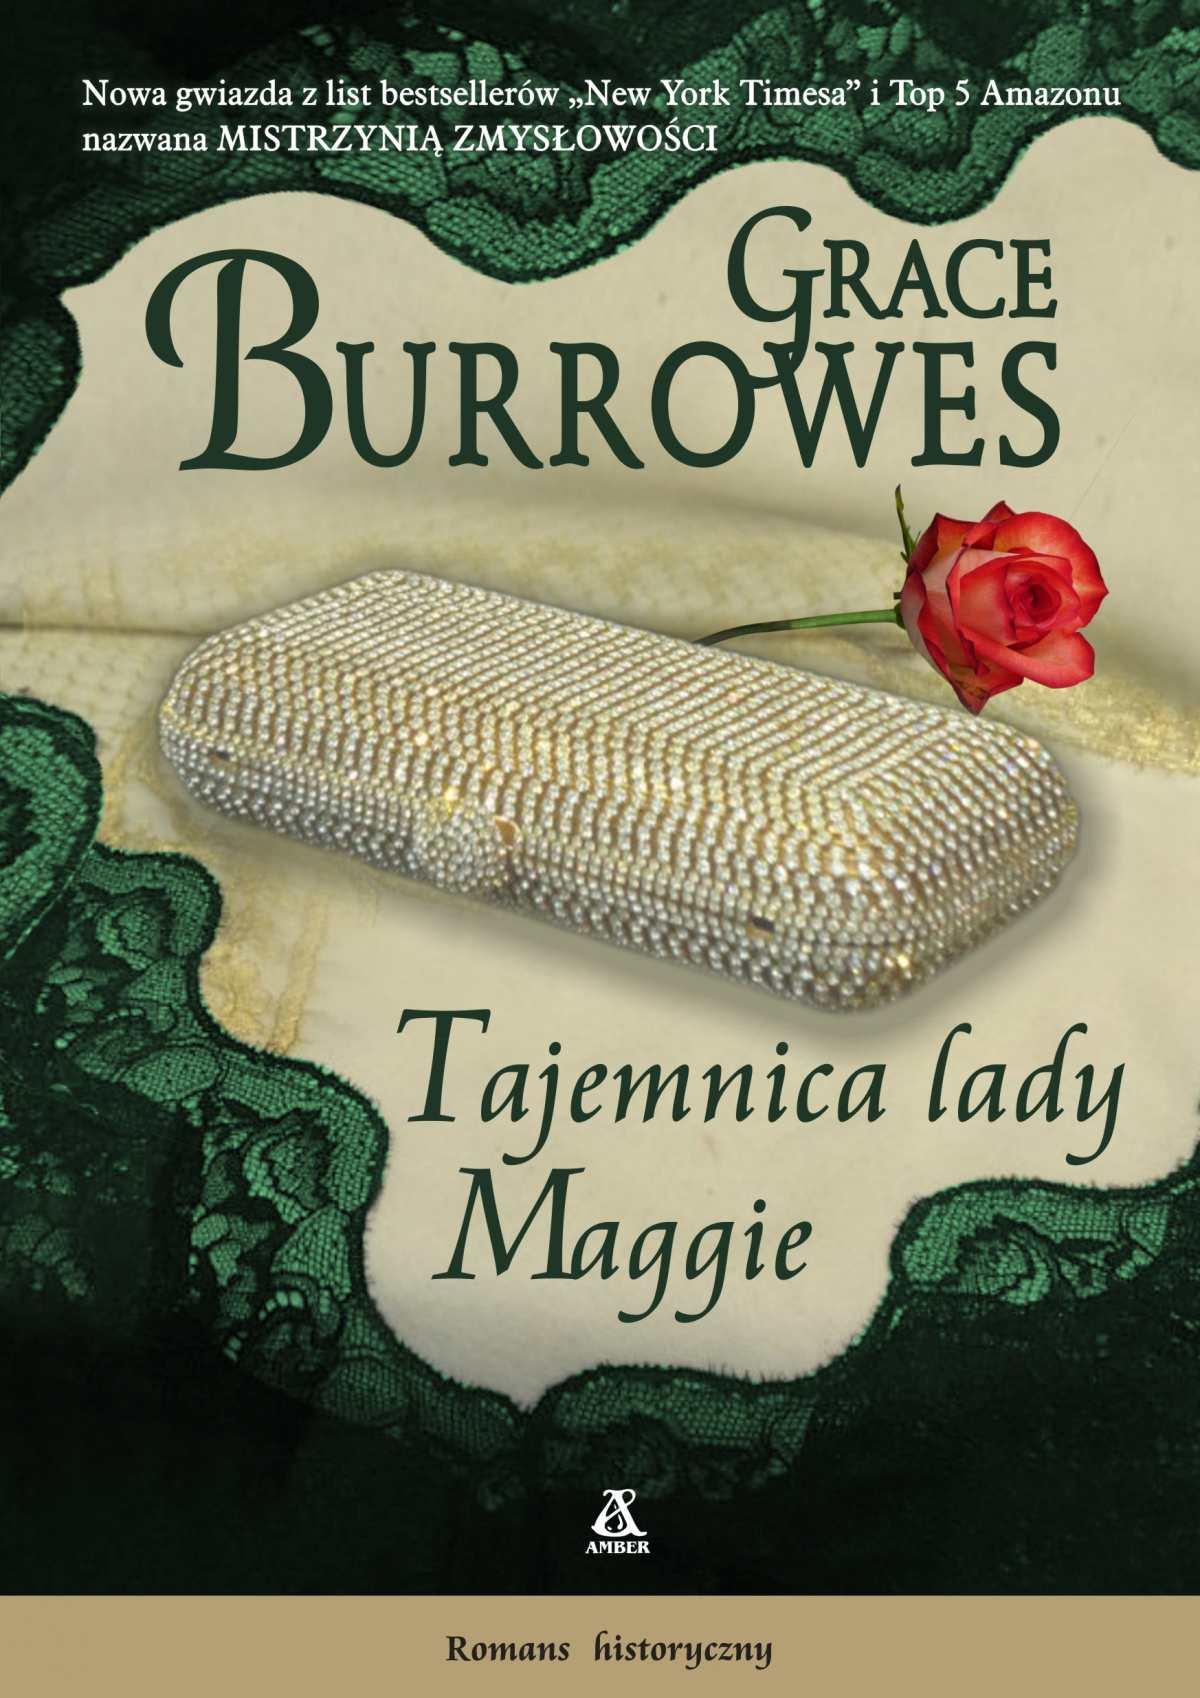 Tajemnica lady Maggie - Grace Burrowes